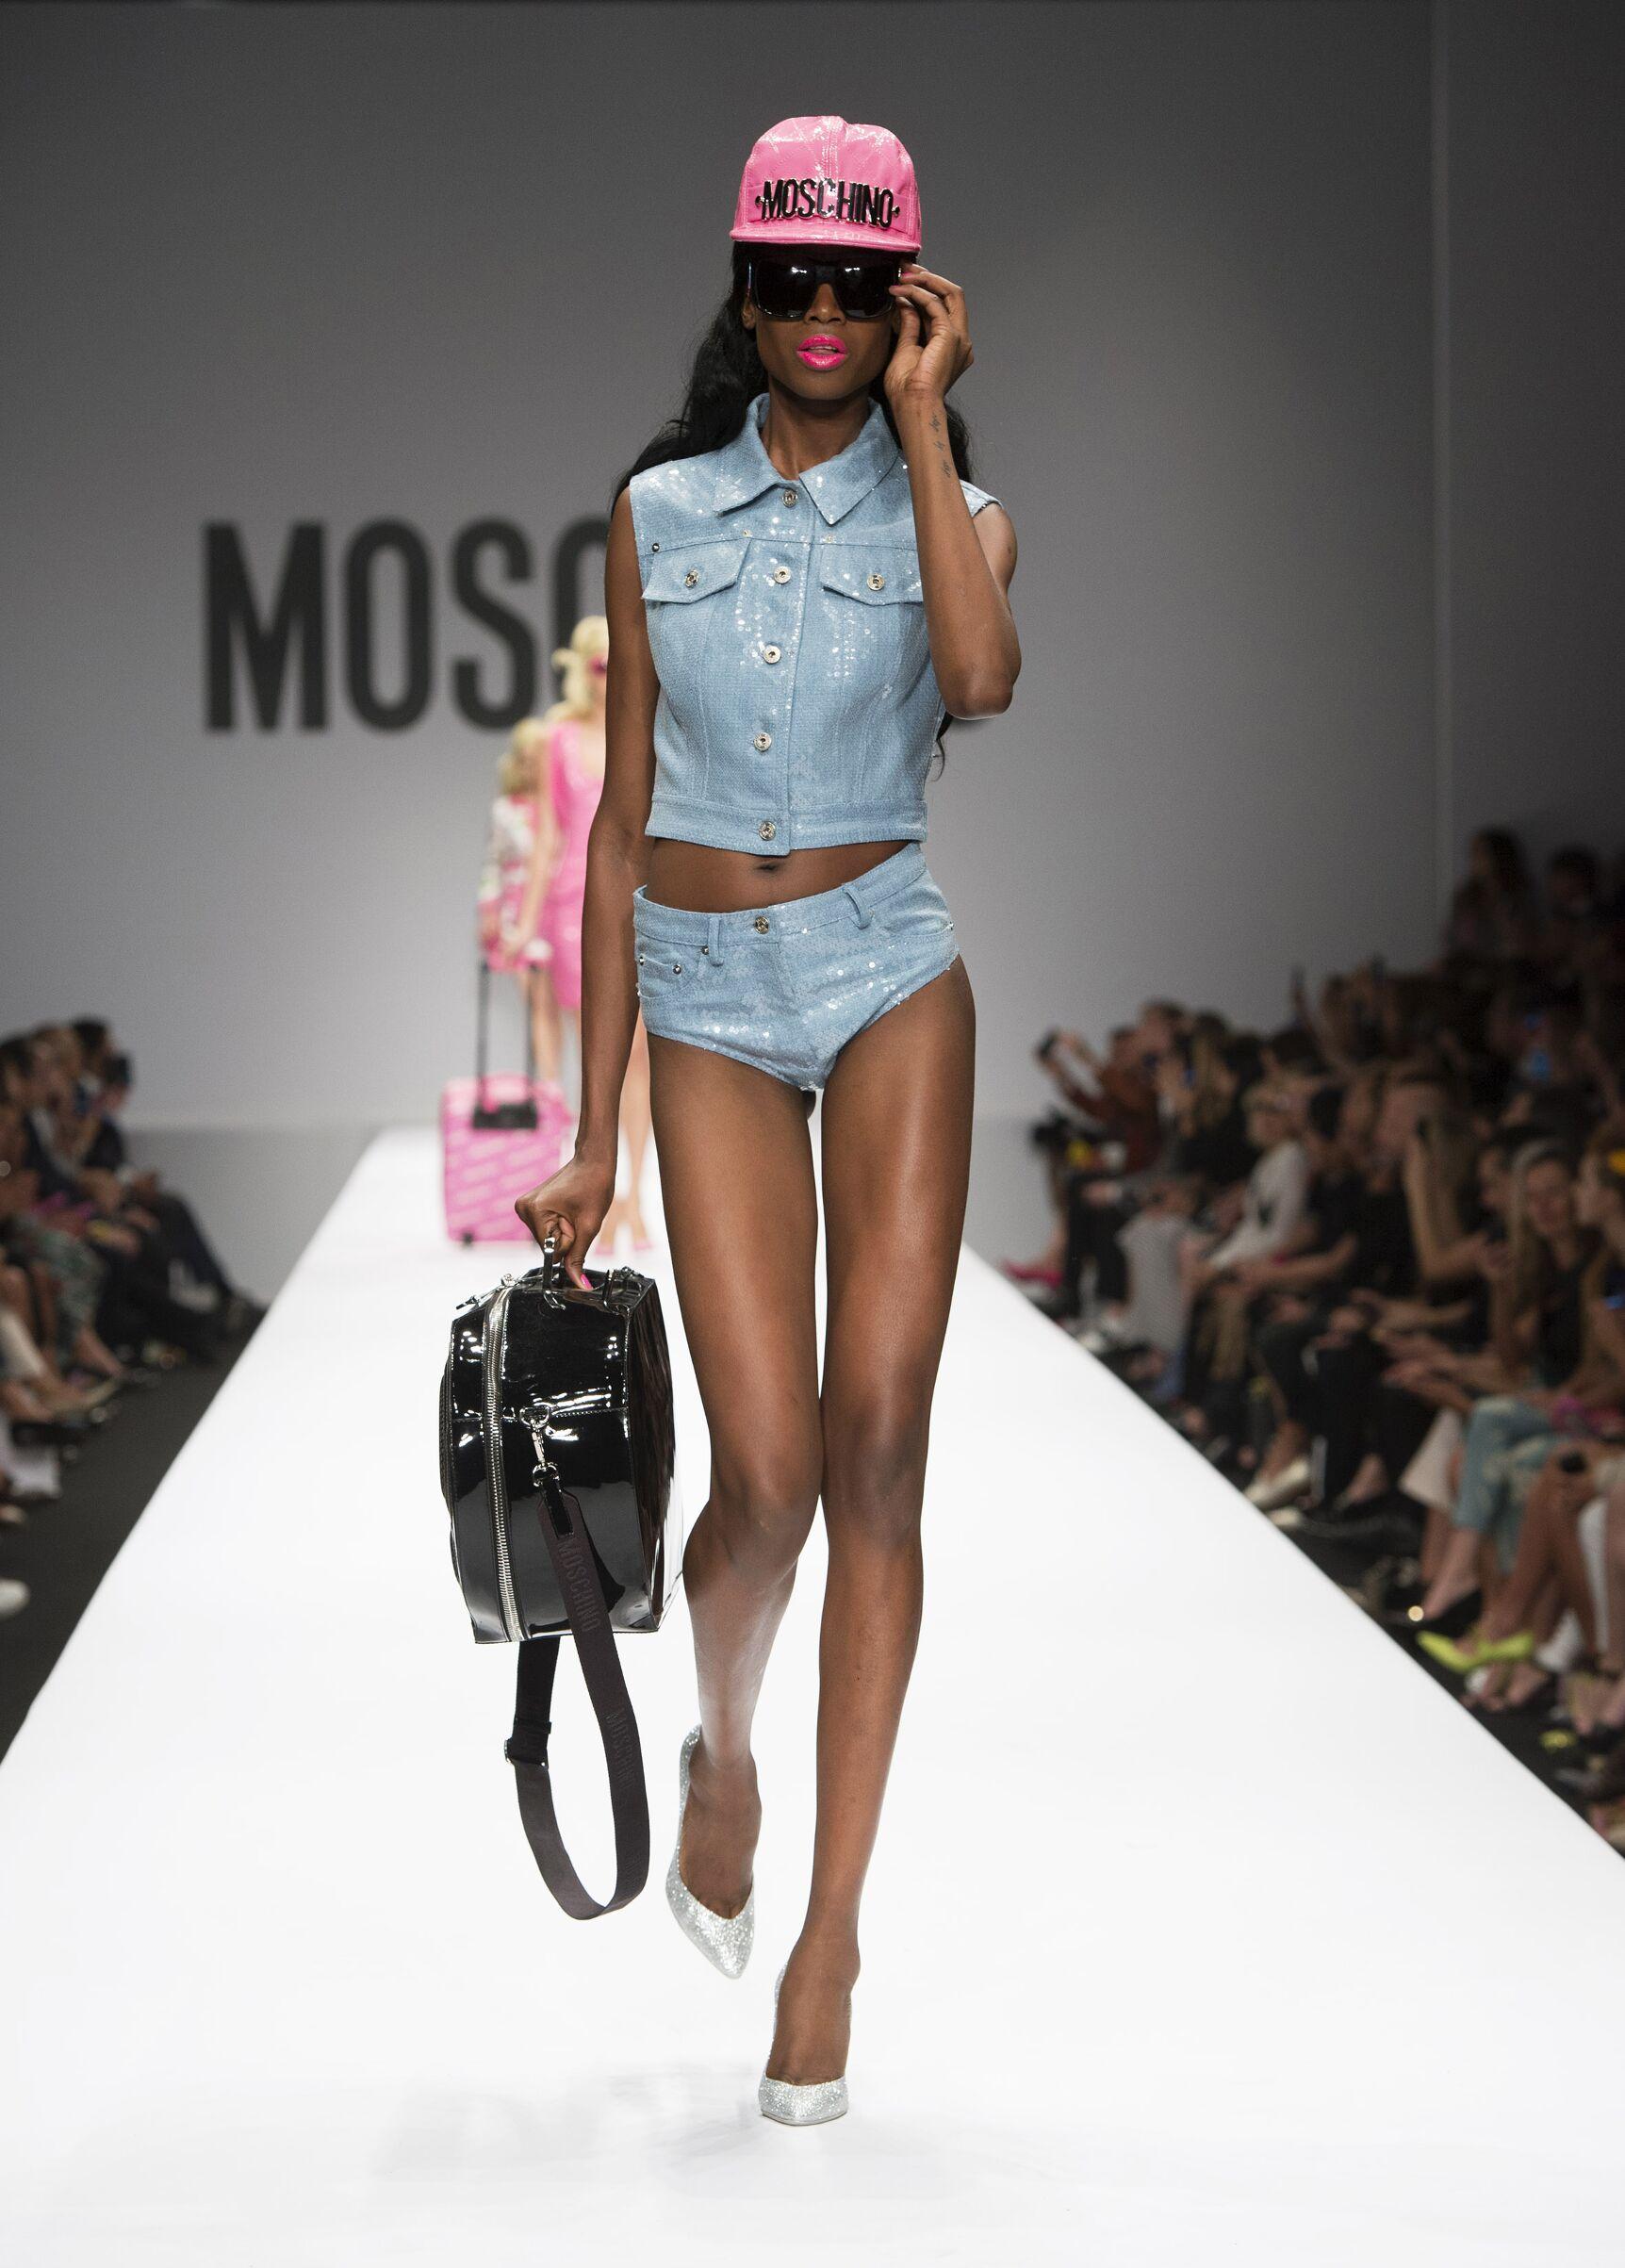 Moschino Catwalk Barbie